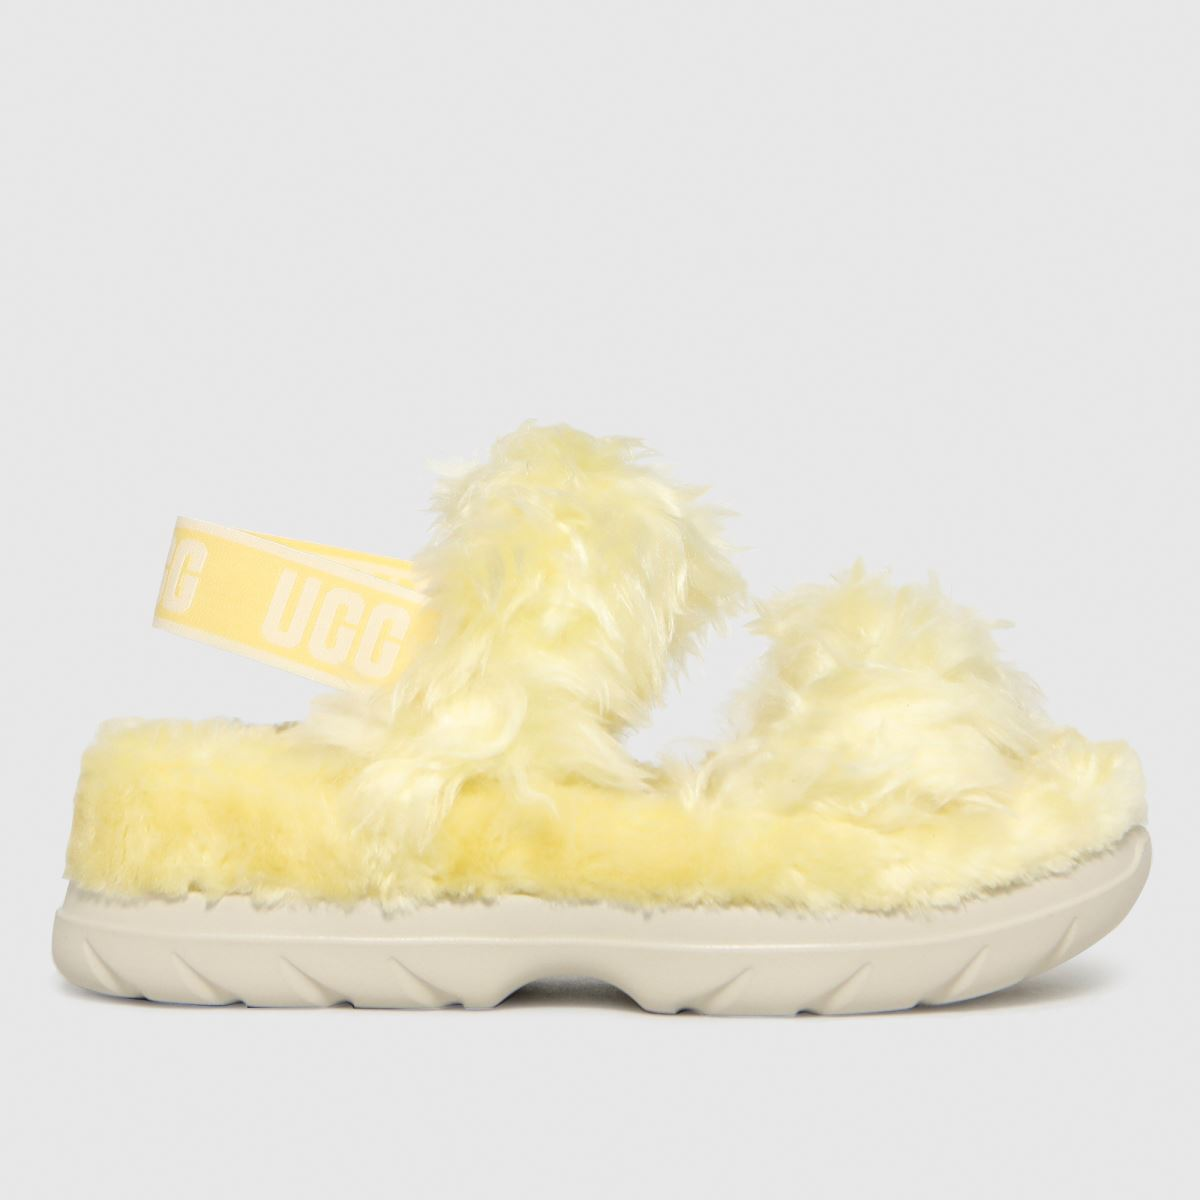 UGG Yellow Fluff Sugar Sandal Slippers